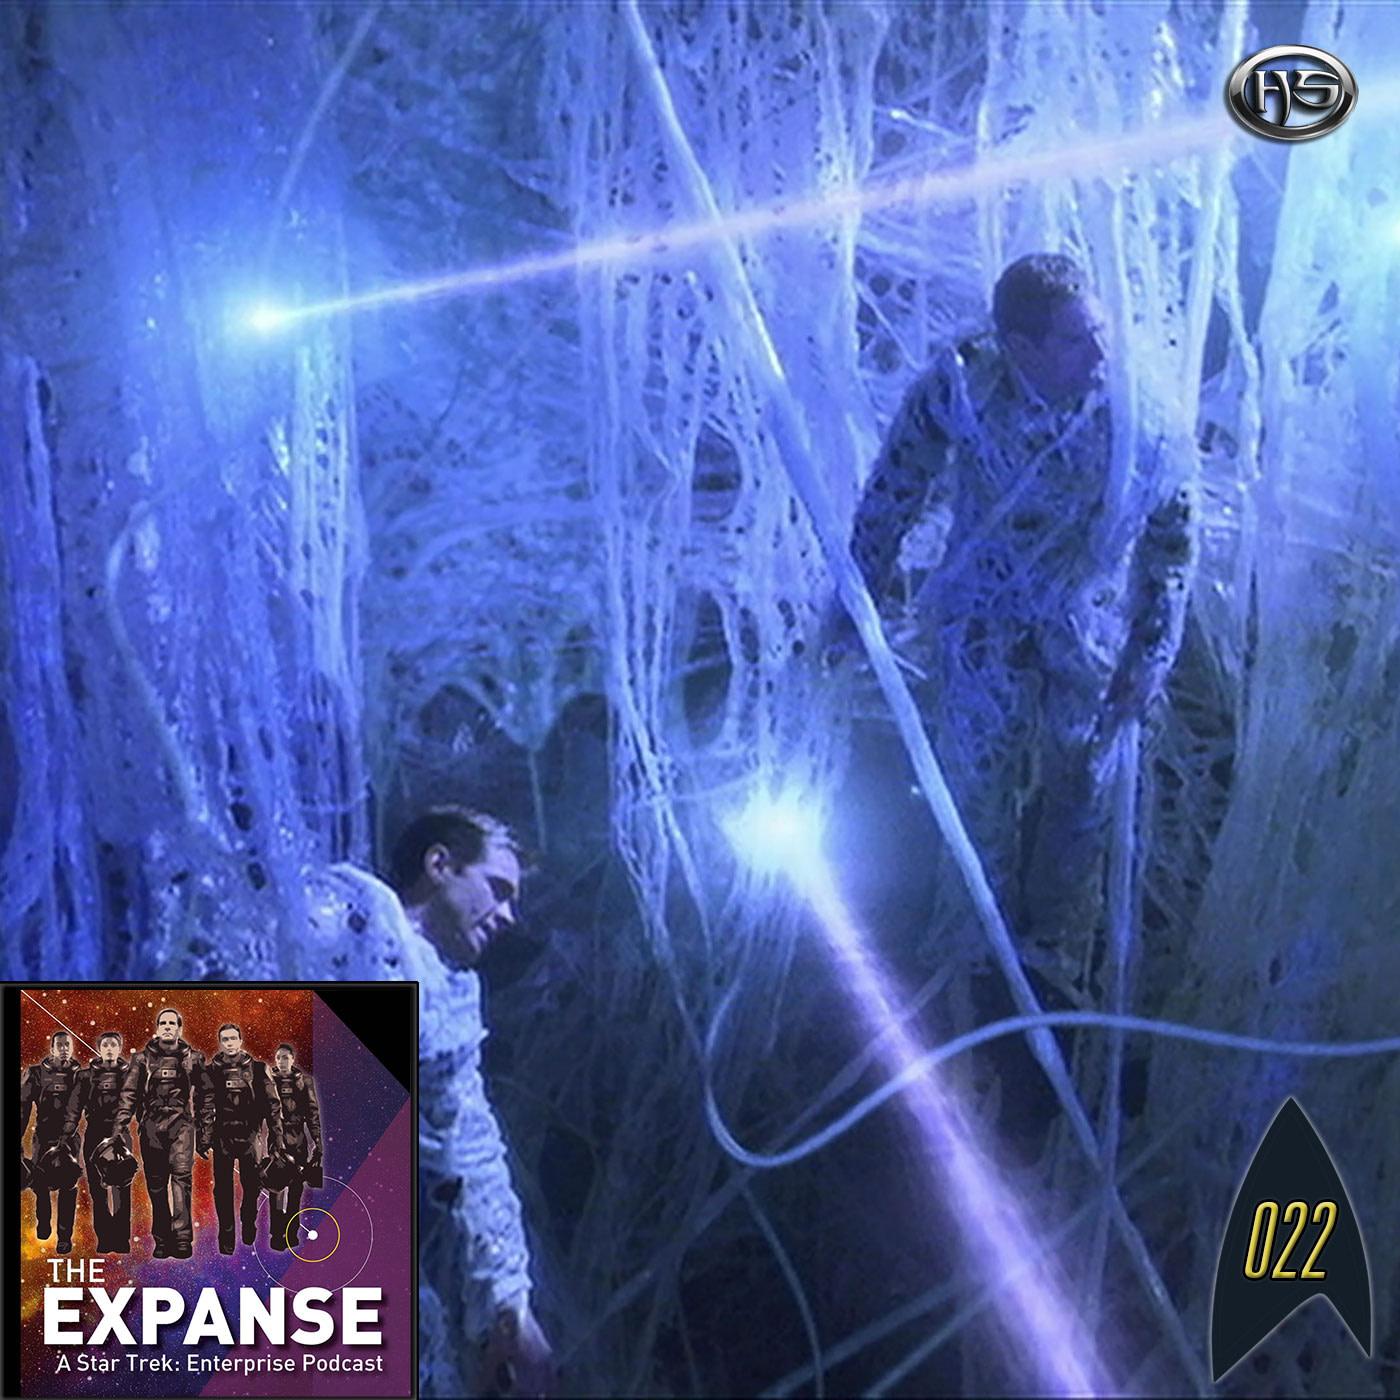 The Expanse Episode 22